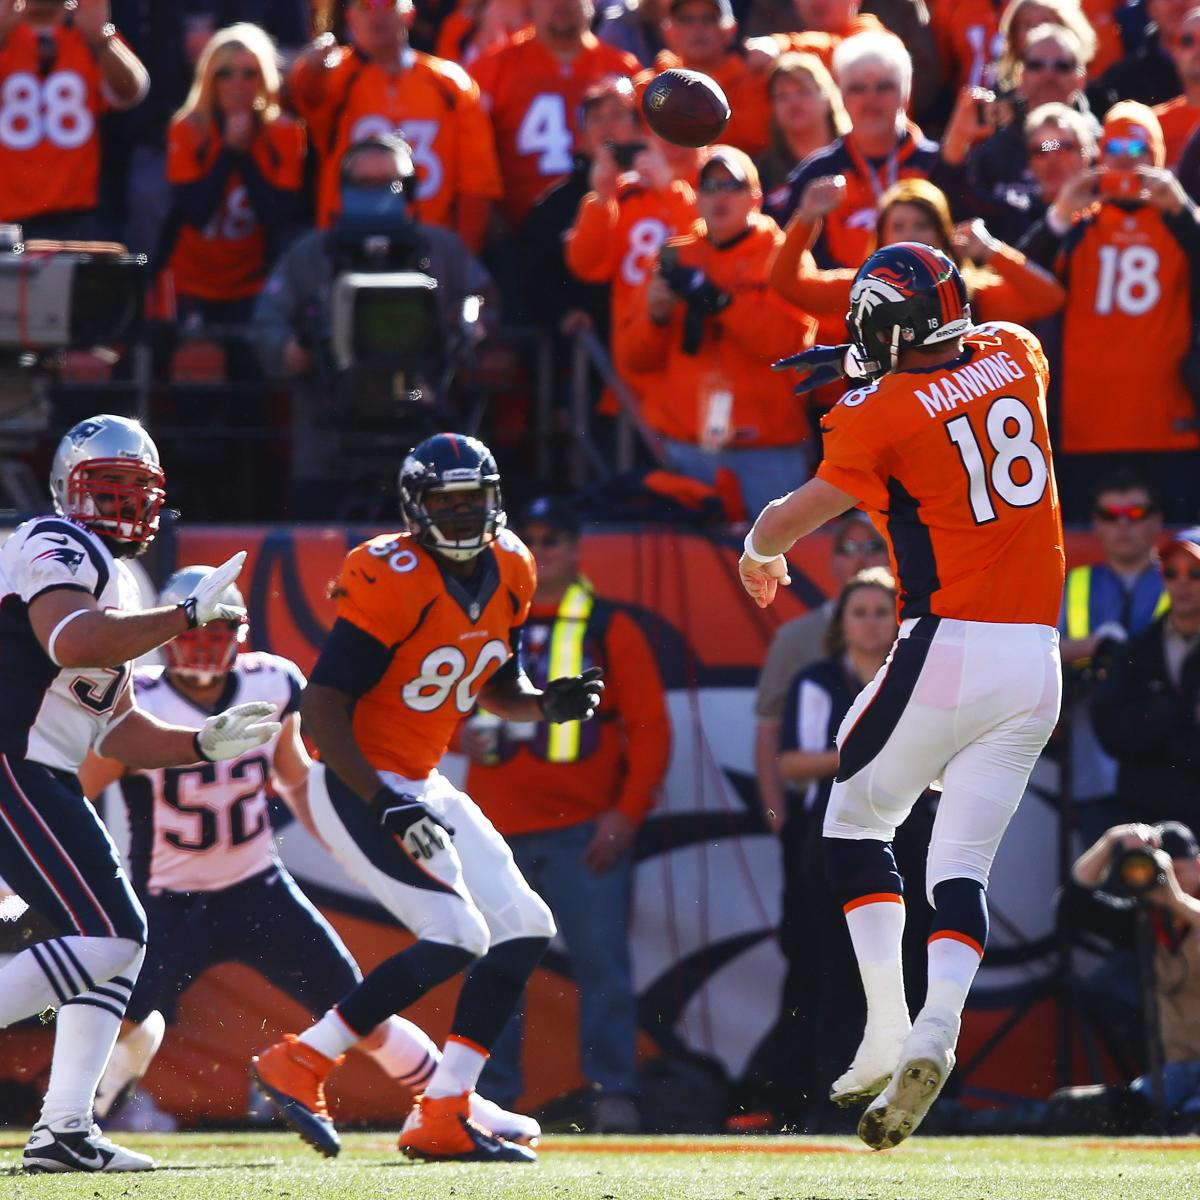 The Latest Denver Broncos News Bleacher Report: Patriots Vs Broncos: Live Score And Reaction For AFC